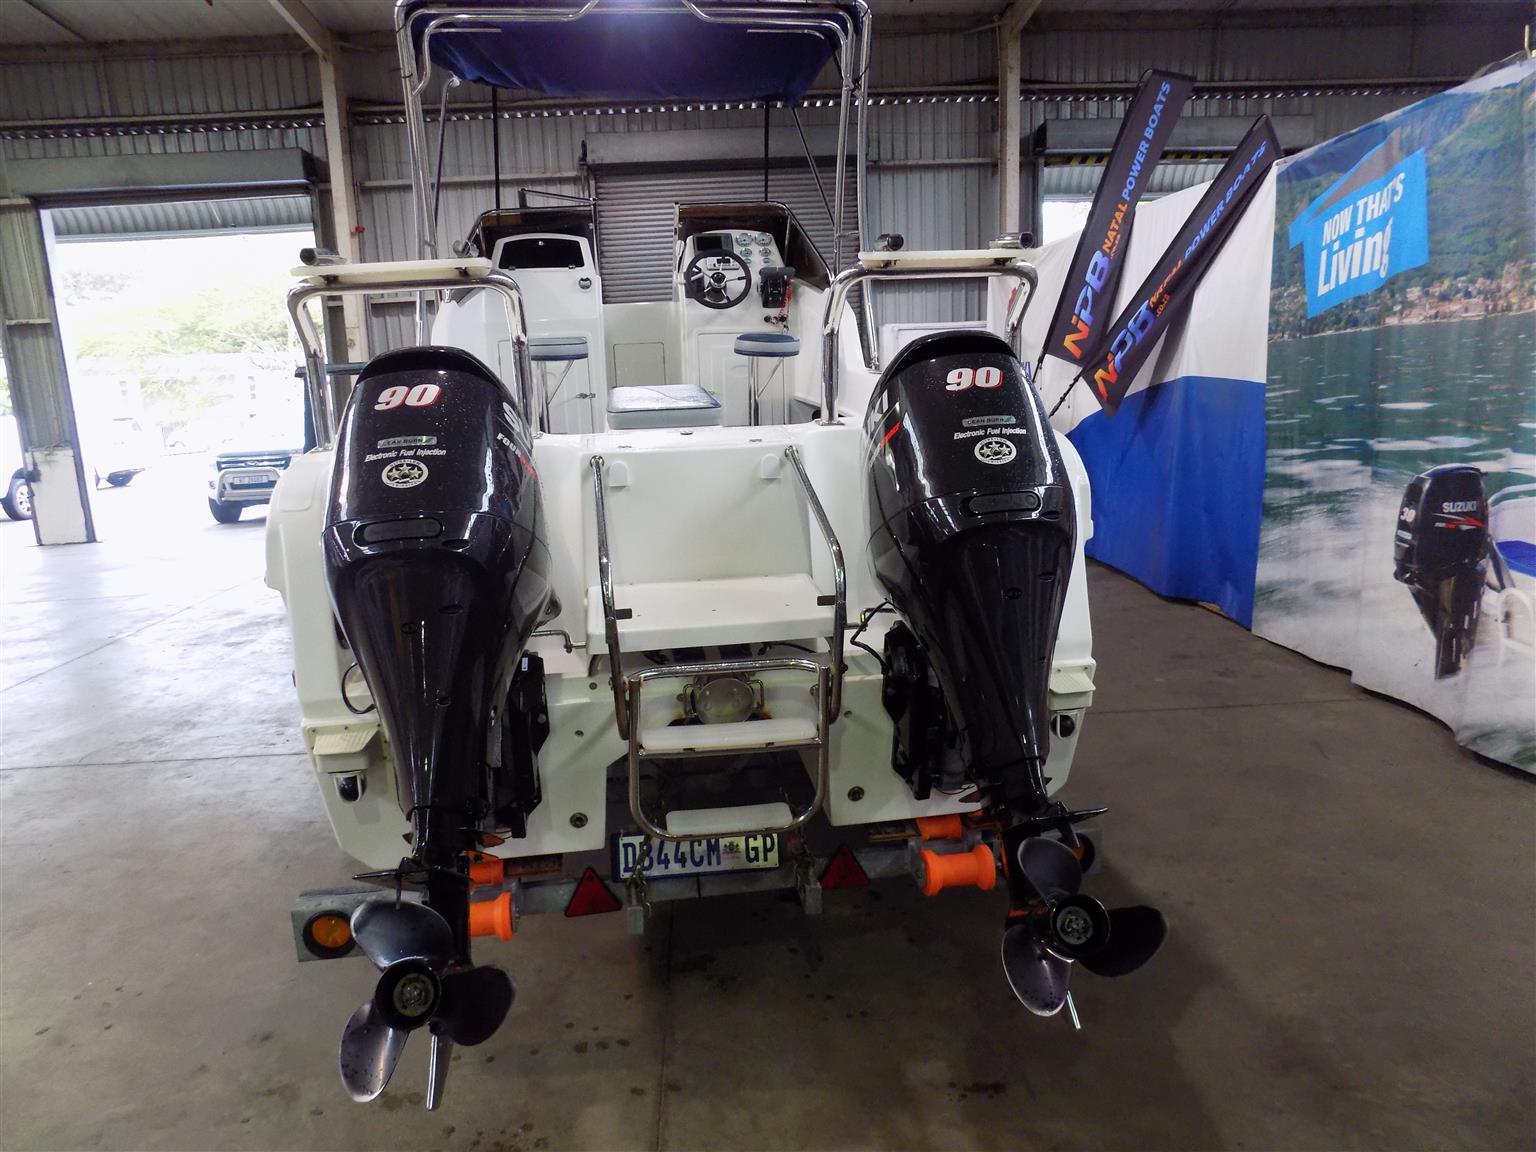 cobra cat 525 on trailer 2 x 90 hp suzuki 4 strokes